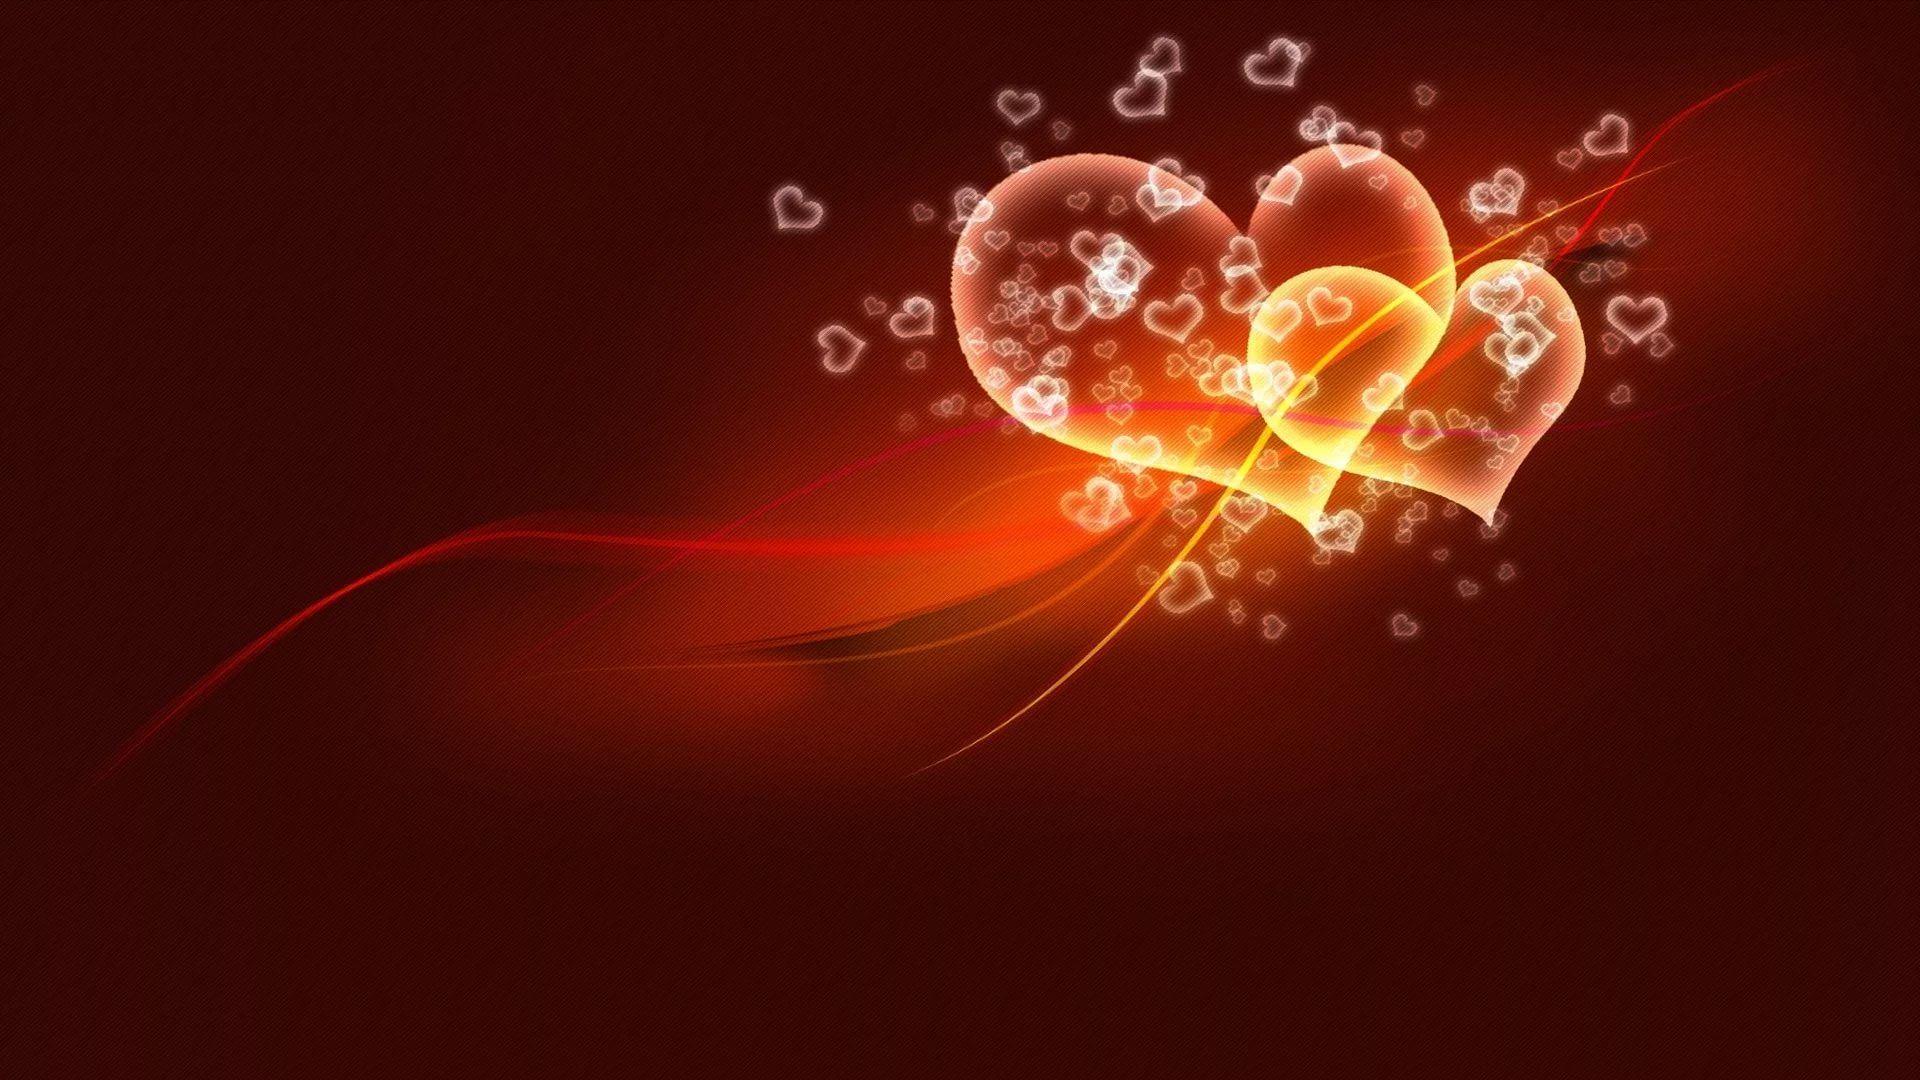 Valentine Screensaver desktop wallpaper download